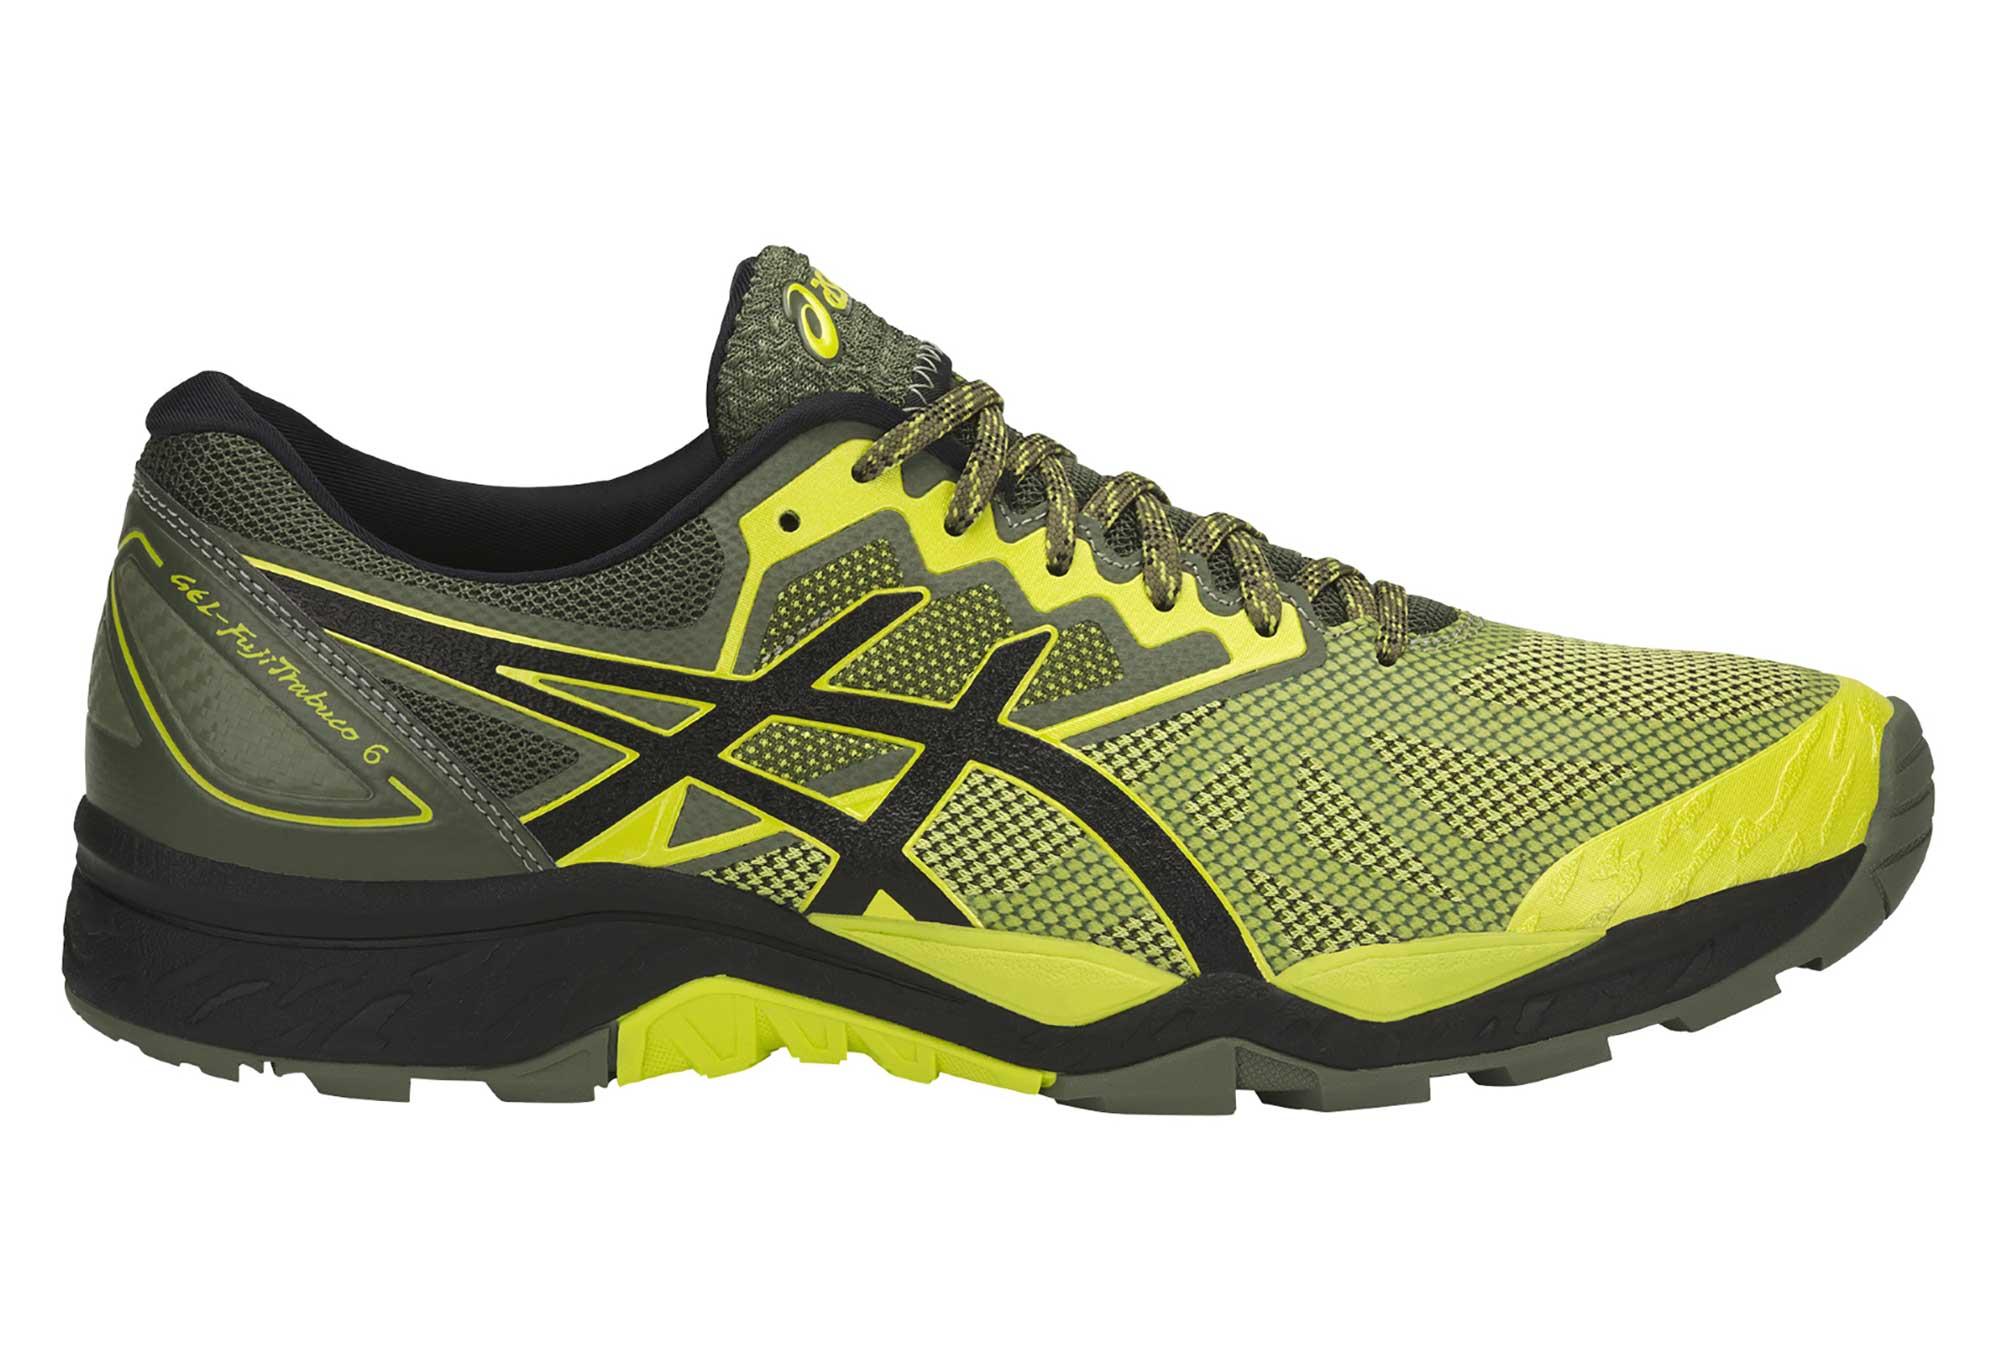 Chaussures de Running Asics Gel Fujitrabuco 6 Jaune Noir